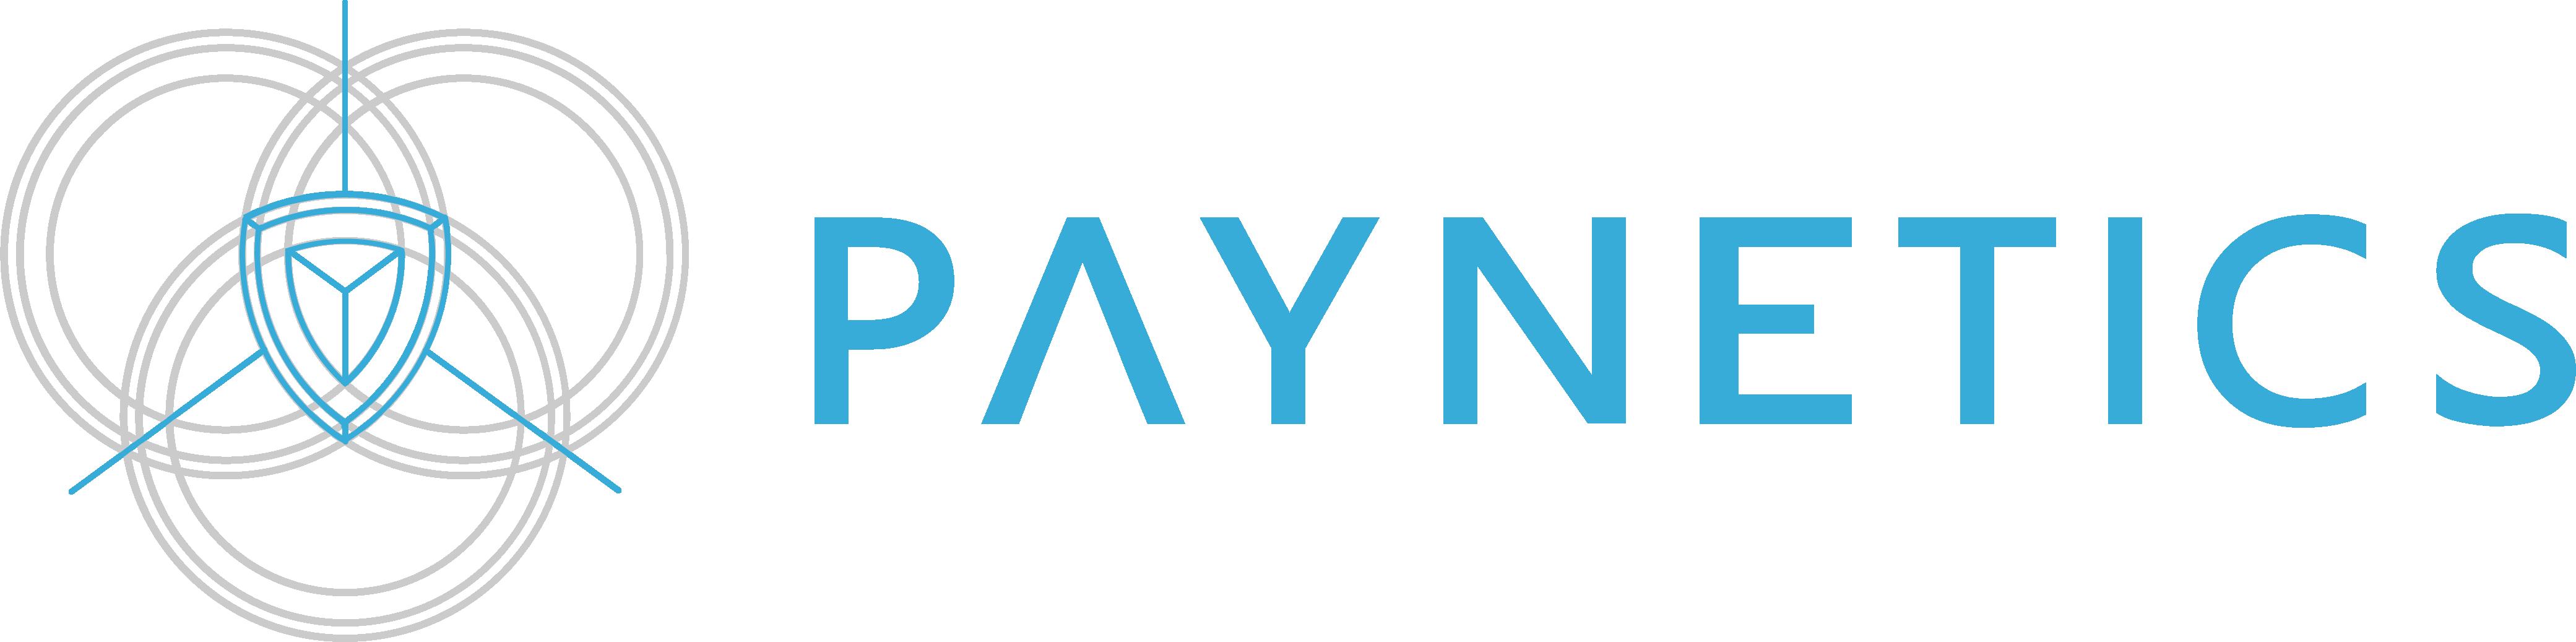 Paynetics – we power embedded finance